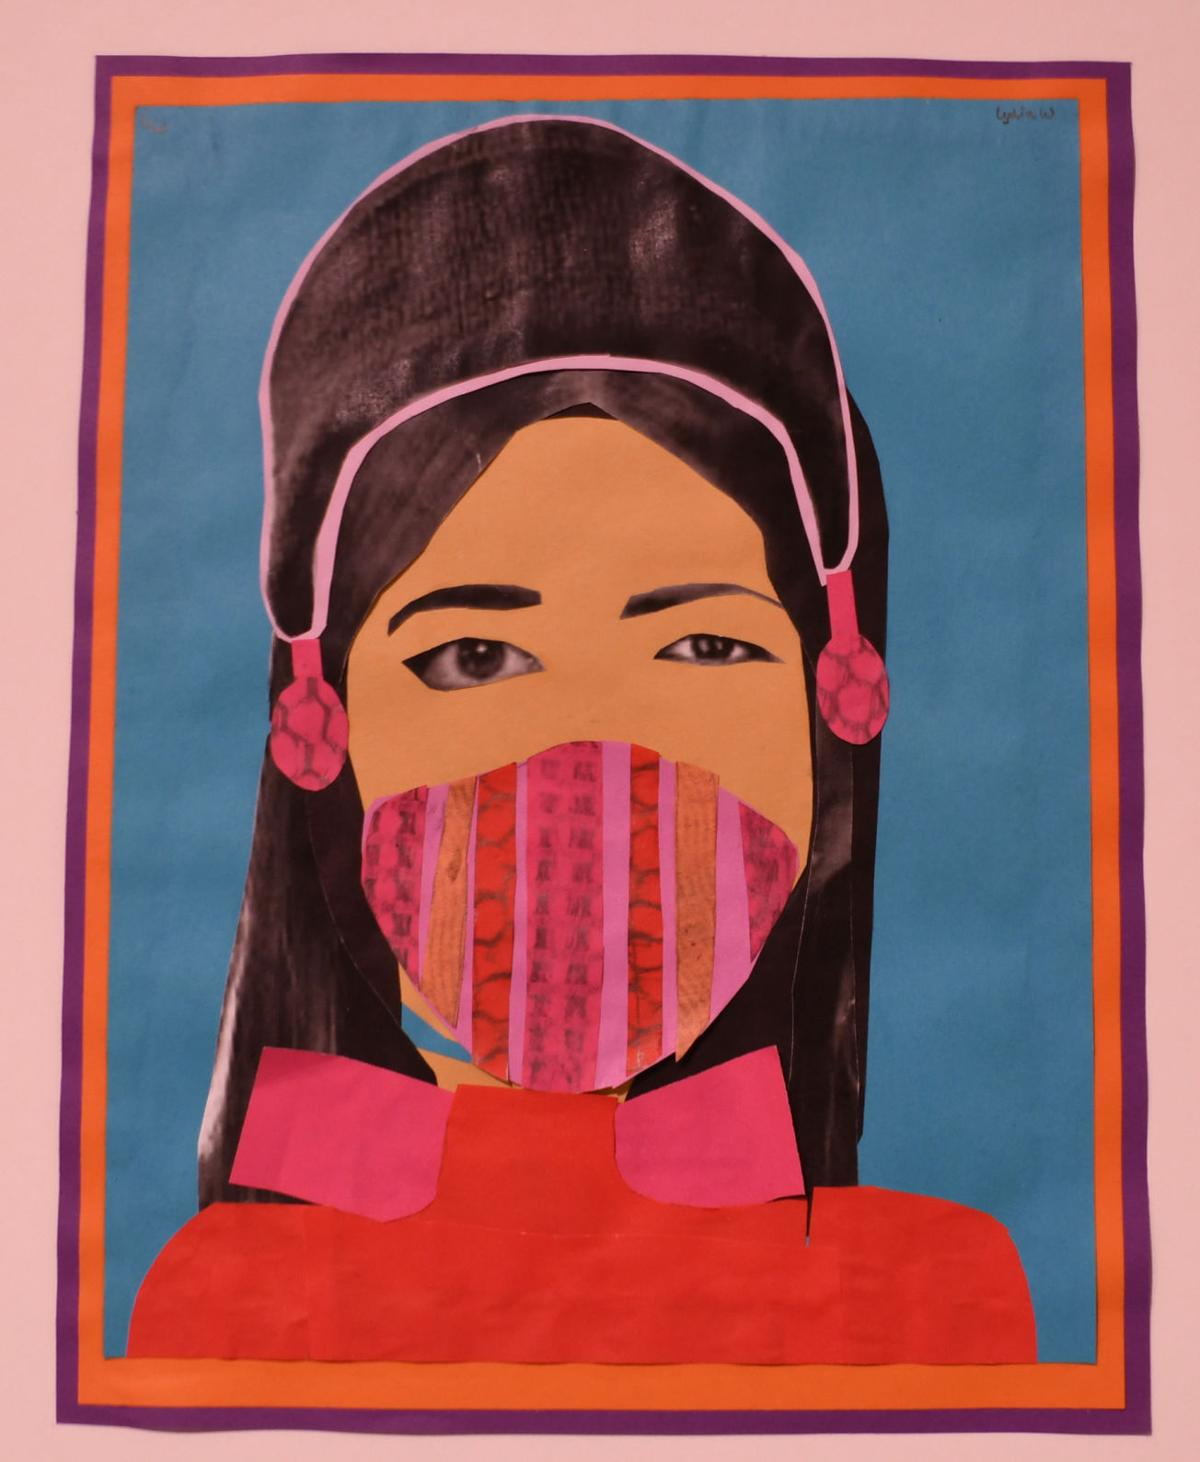 Wang, The Asian Winter Girl.jpg